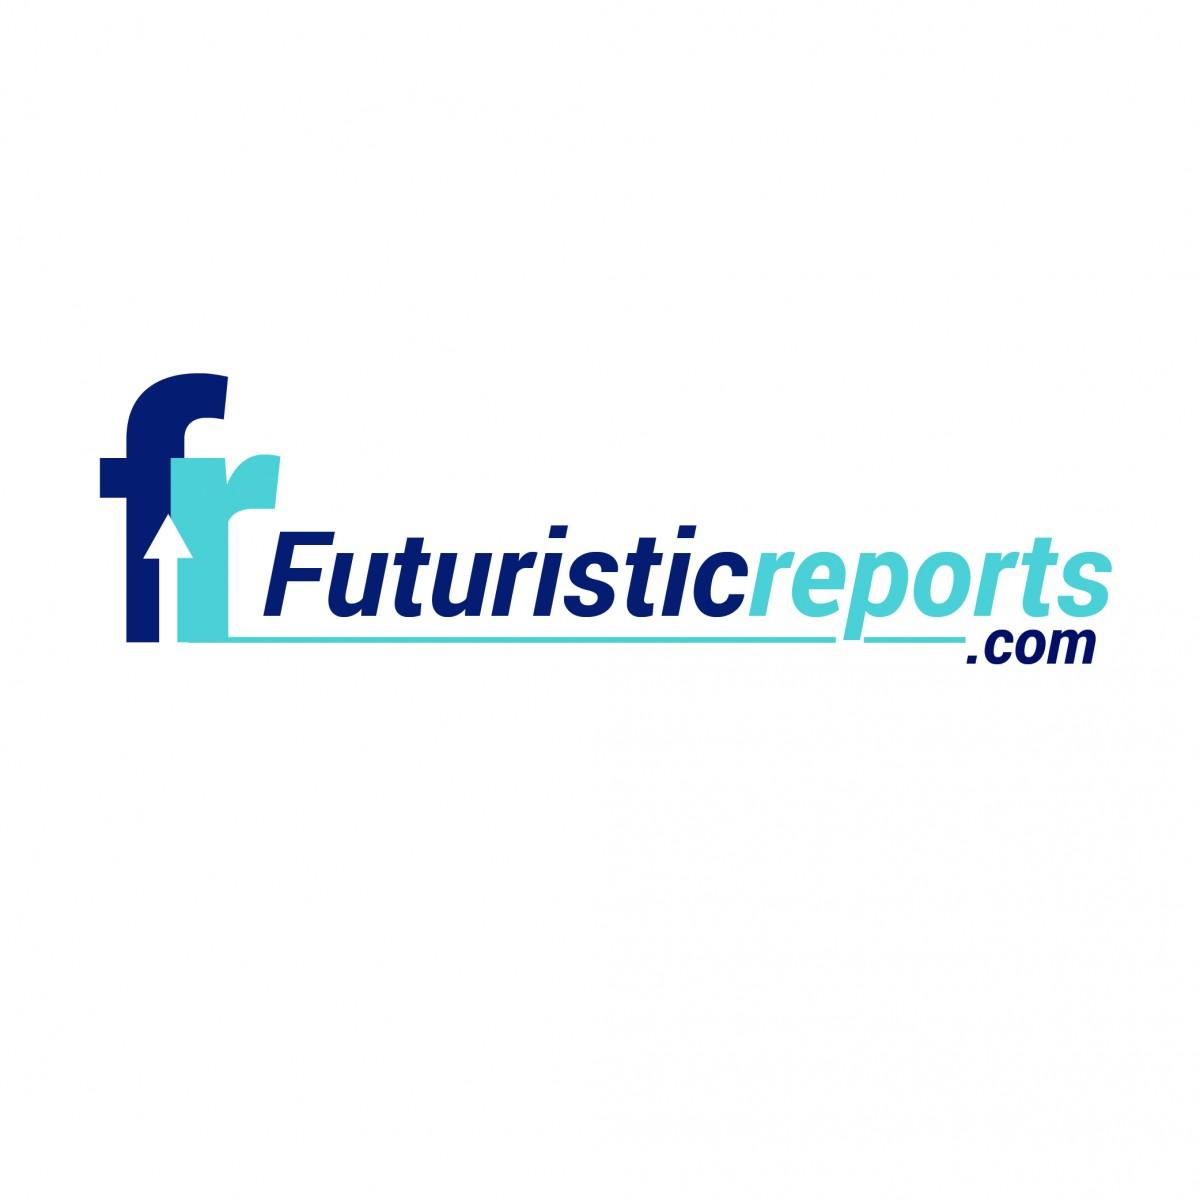 futuristicreports.com_logo-01